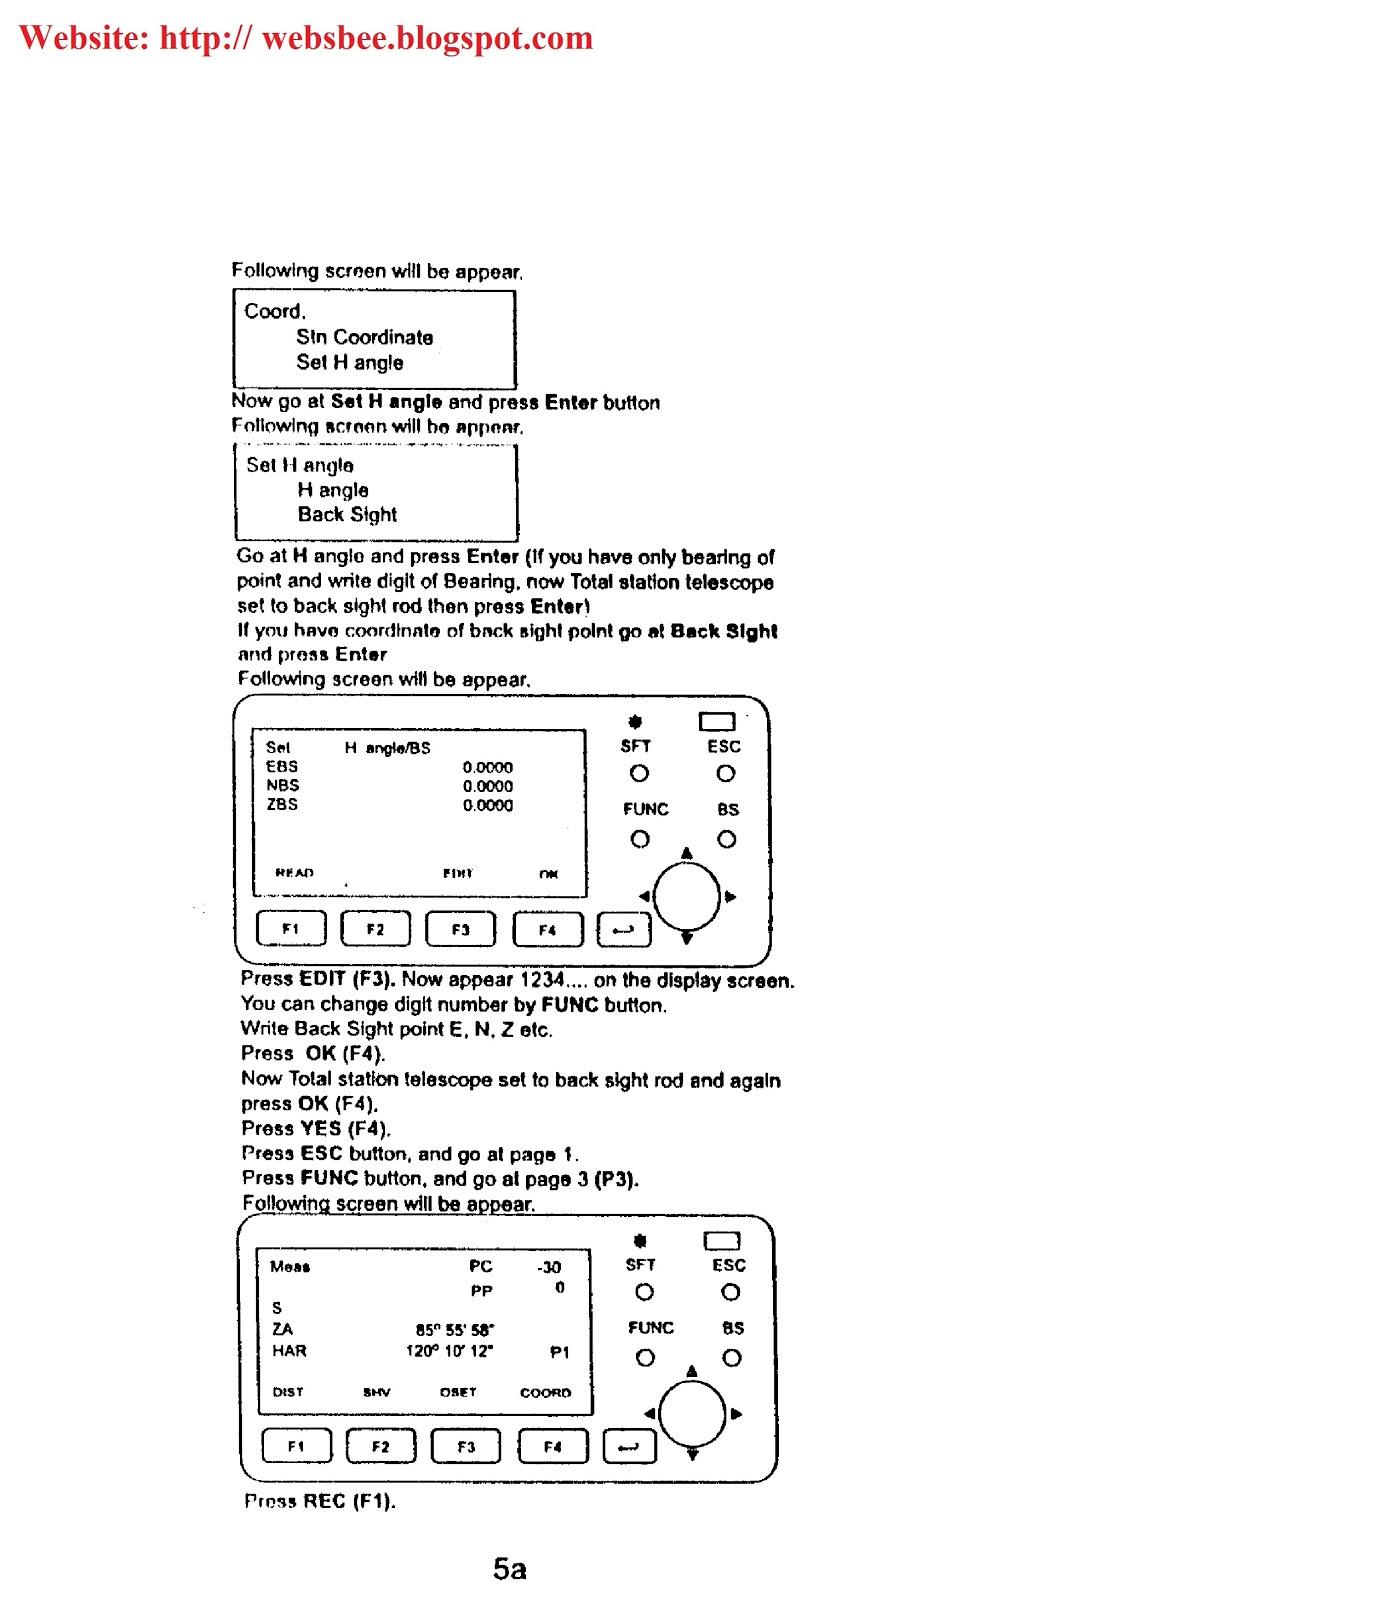 raja farrukh s blog sokkia total station manual training in urdu rh websbee blogspot com Sokkia Model 116 Sokkia CX 103